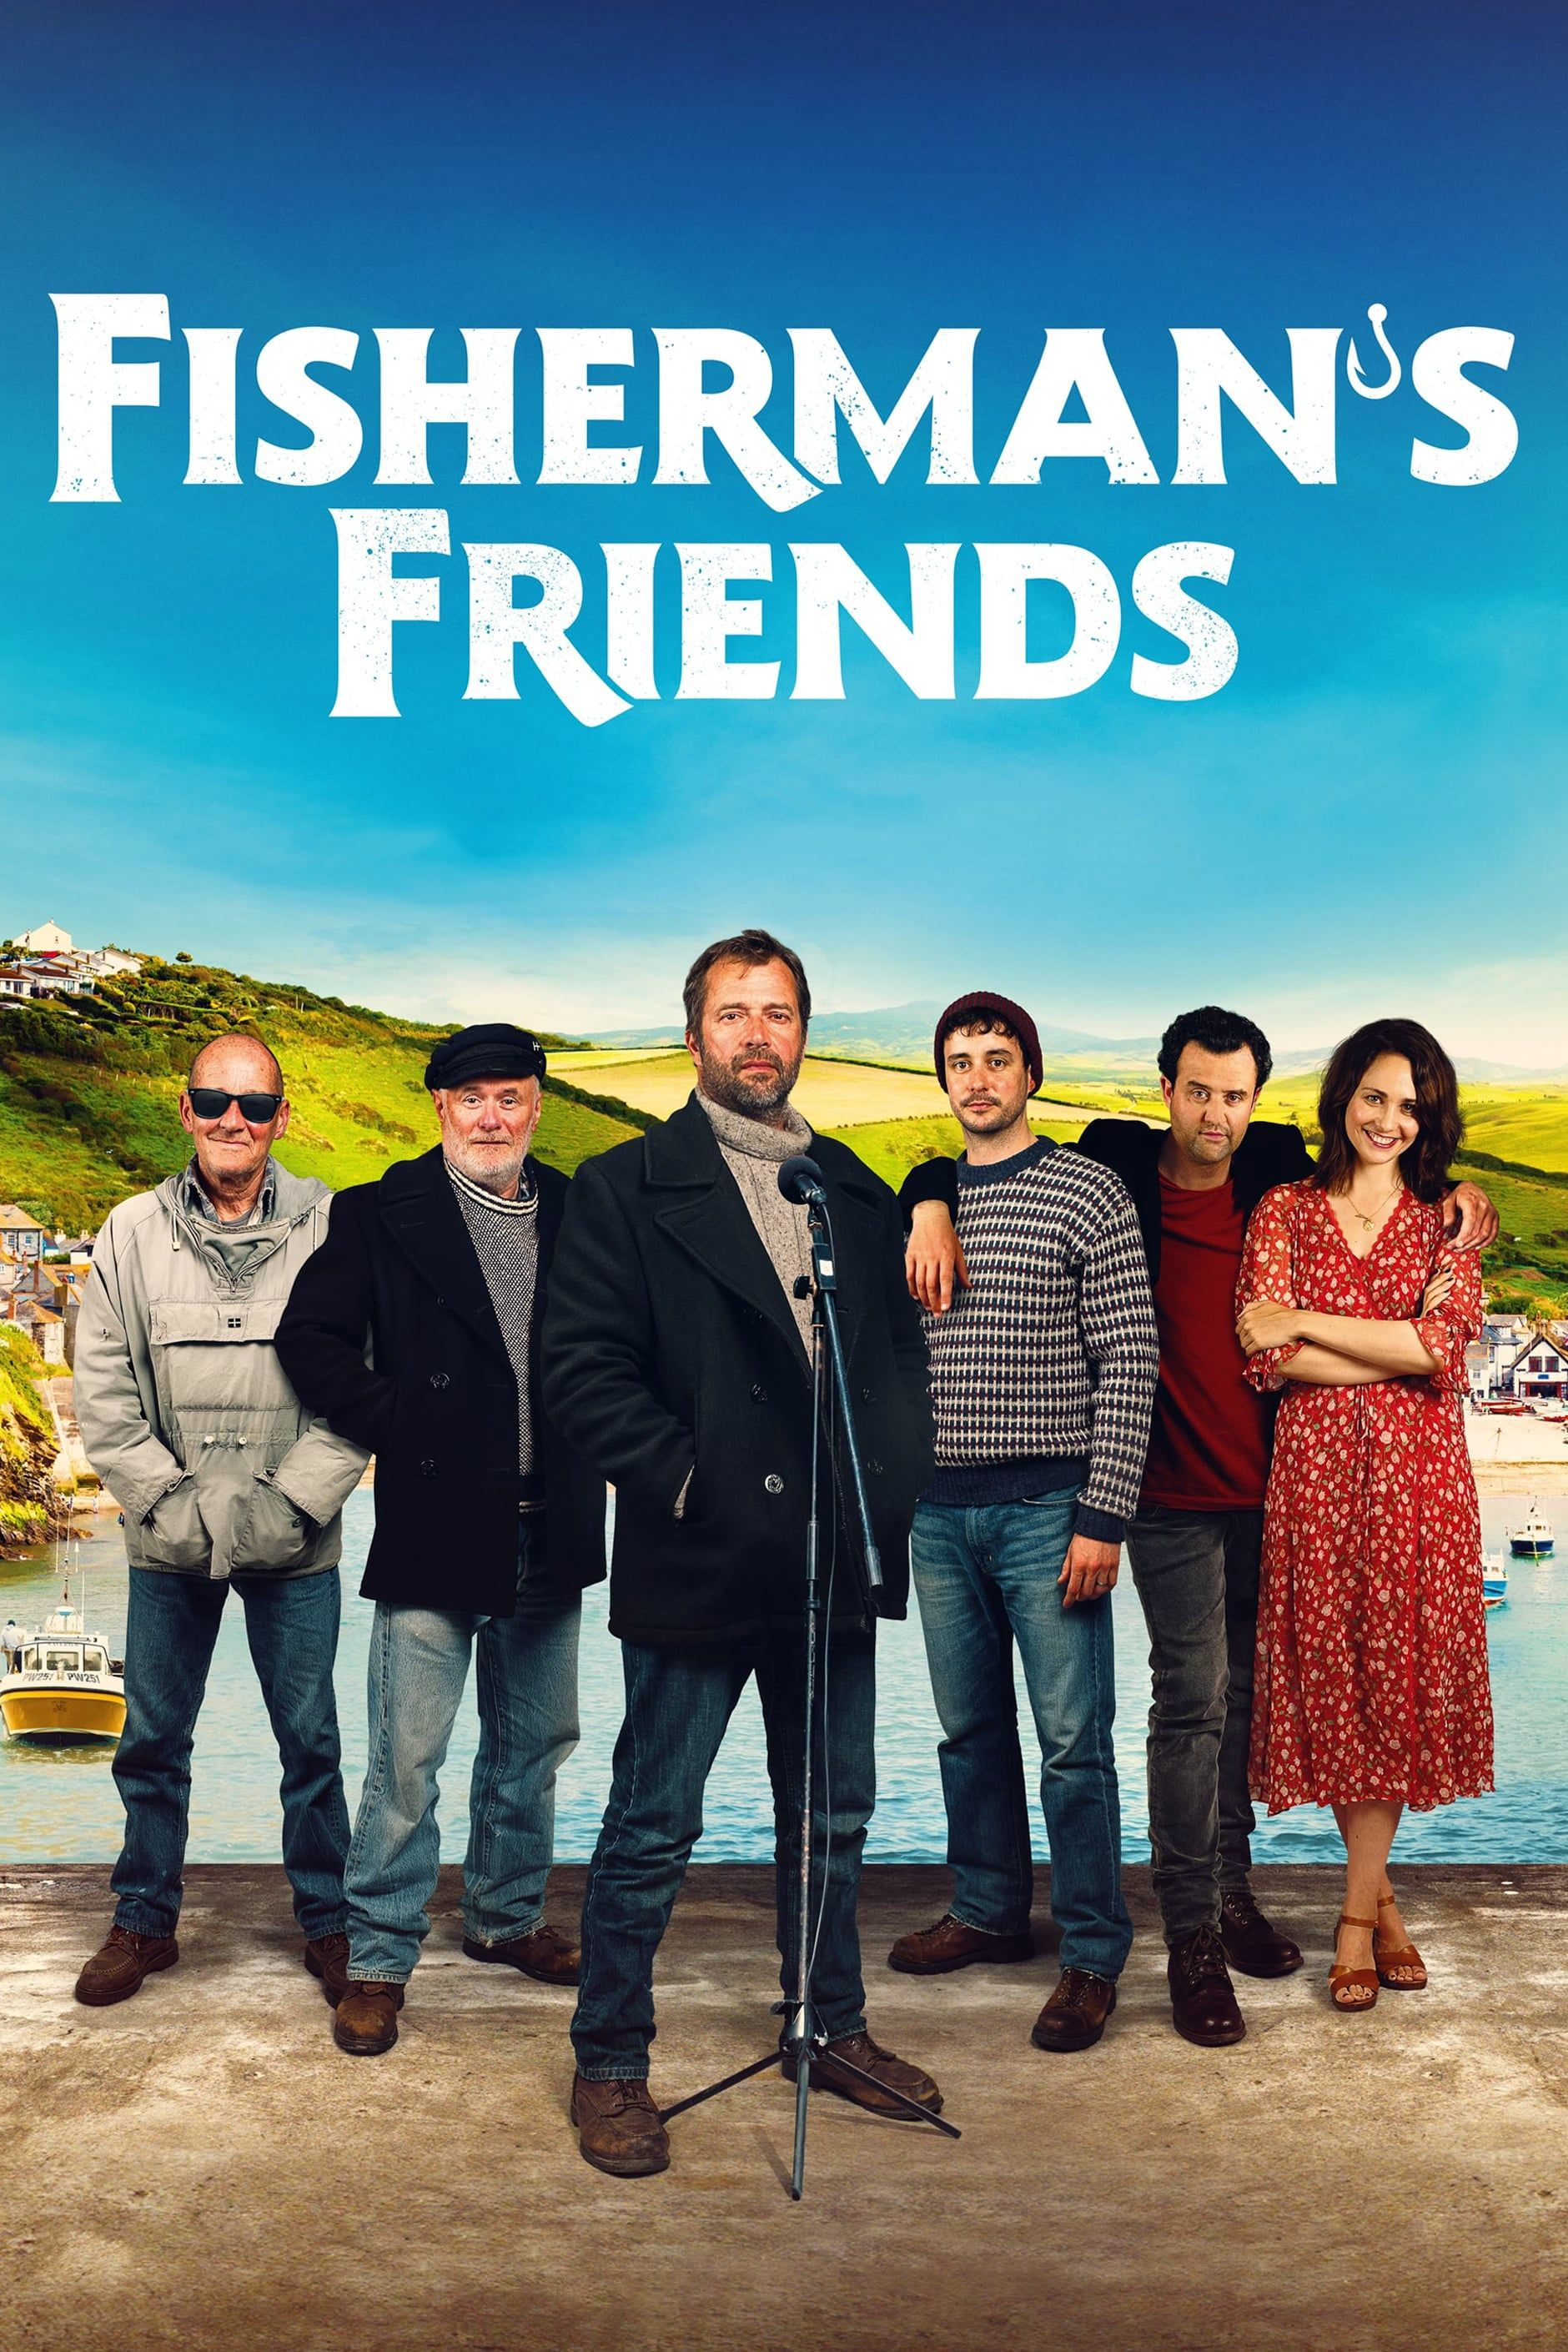 Fullwatch fishermans friends 2019 full online movie